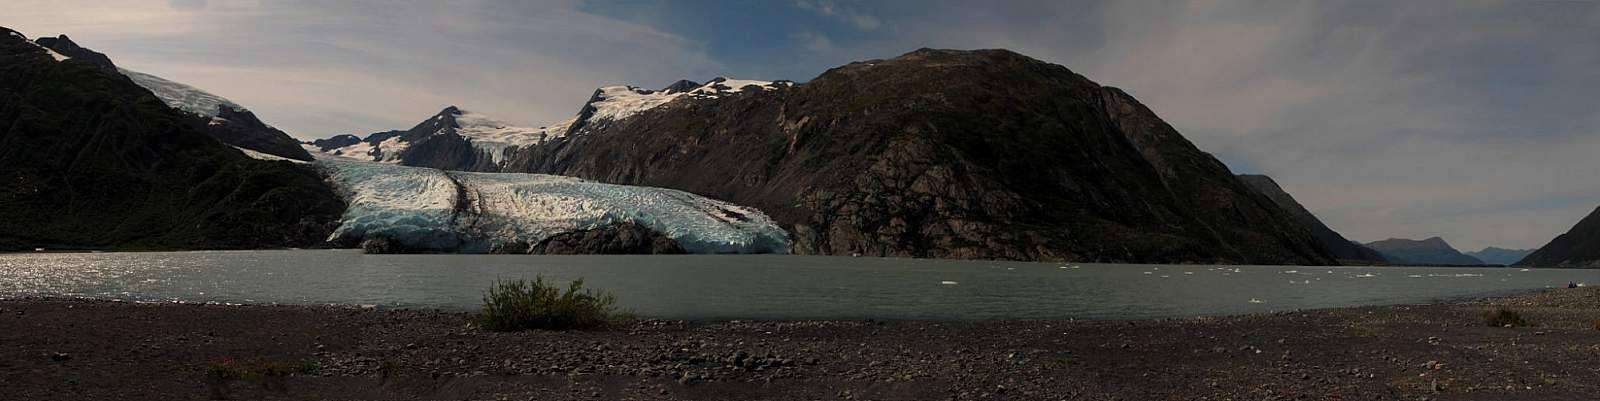 Portage Pass Trail Alaska Org